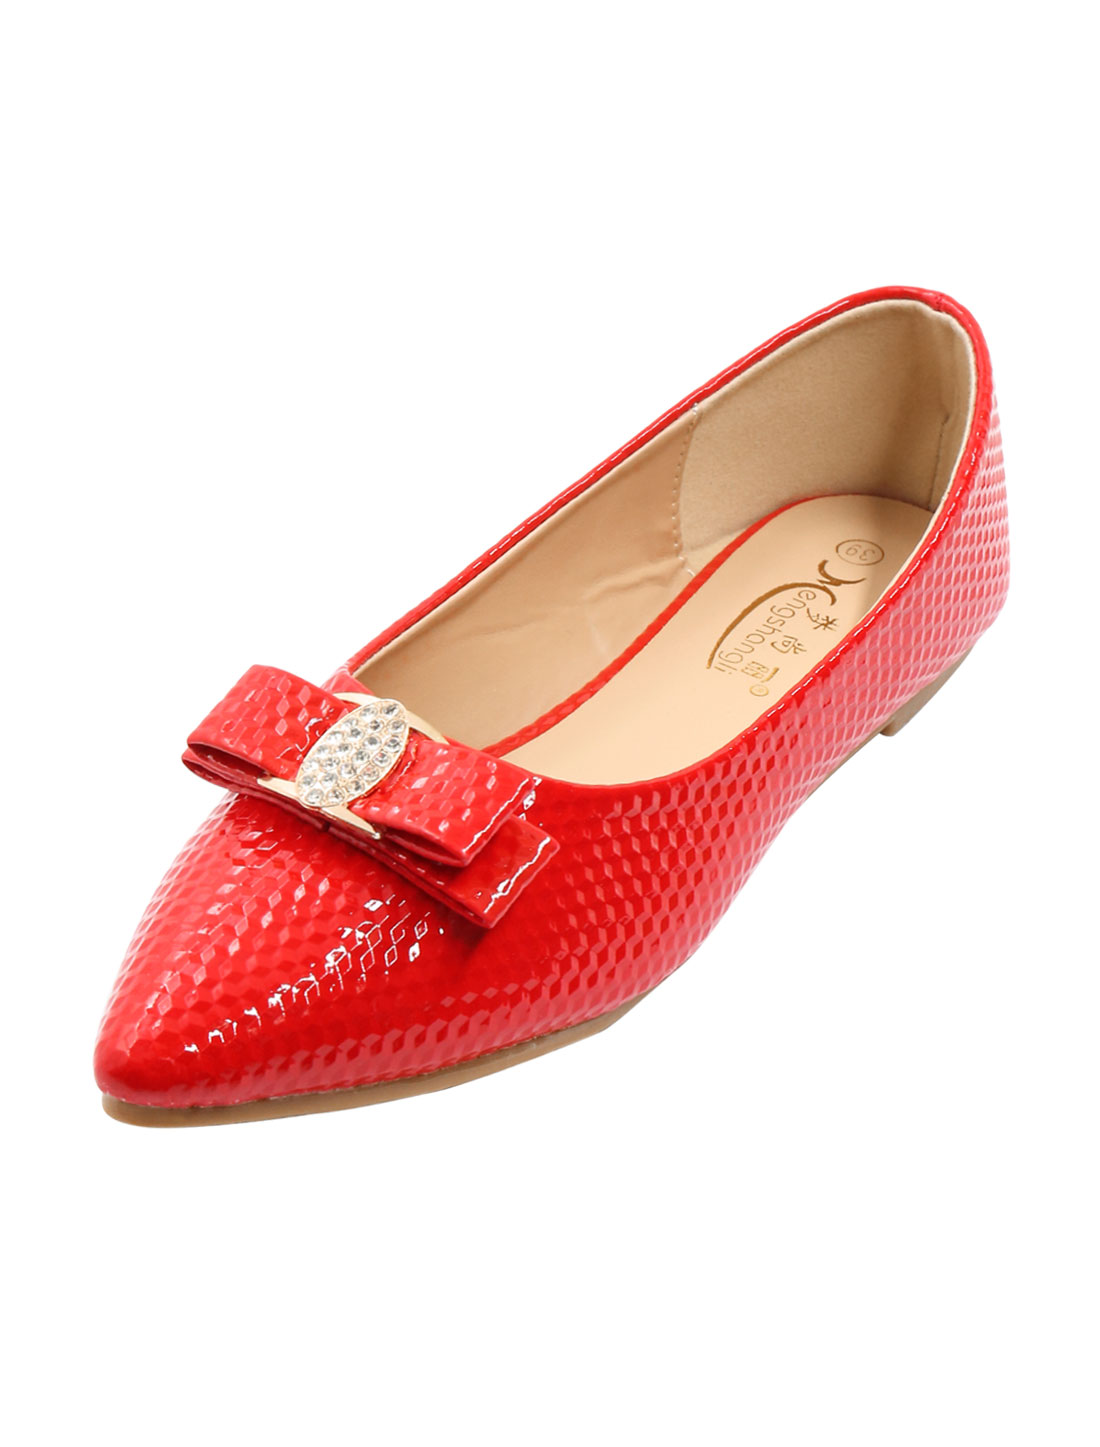 Ladies Rhinestones Bowknot Decor Textured Pointed Toe Flats Red US 9